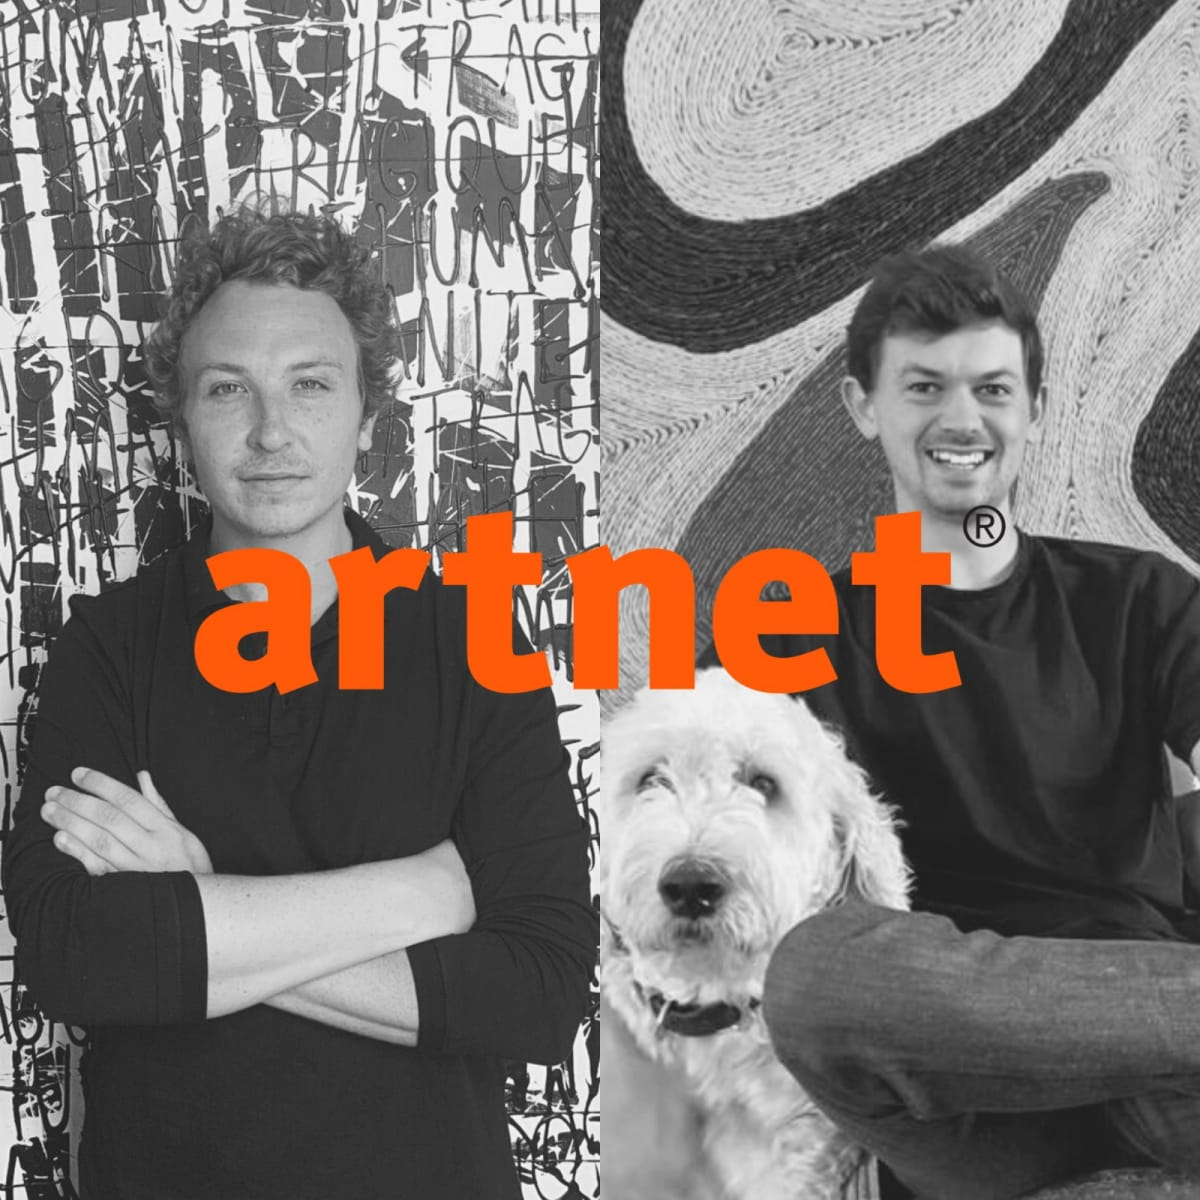 Edward Sanders & Michael Howes, founders of D'Stassi Art.